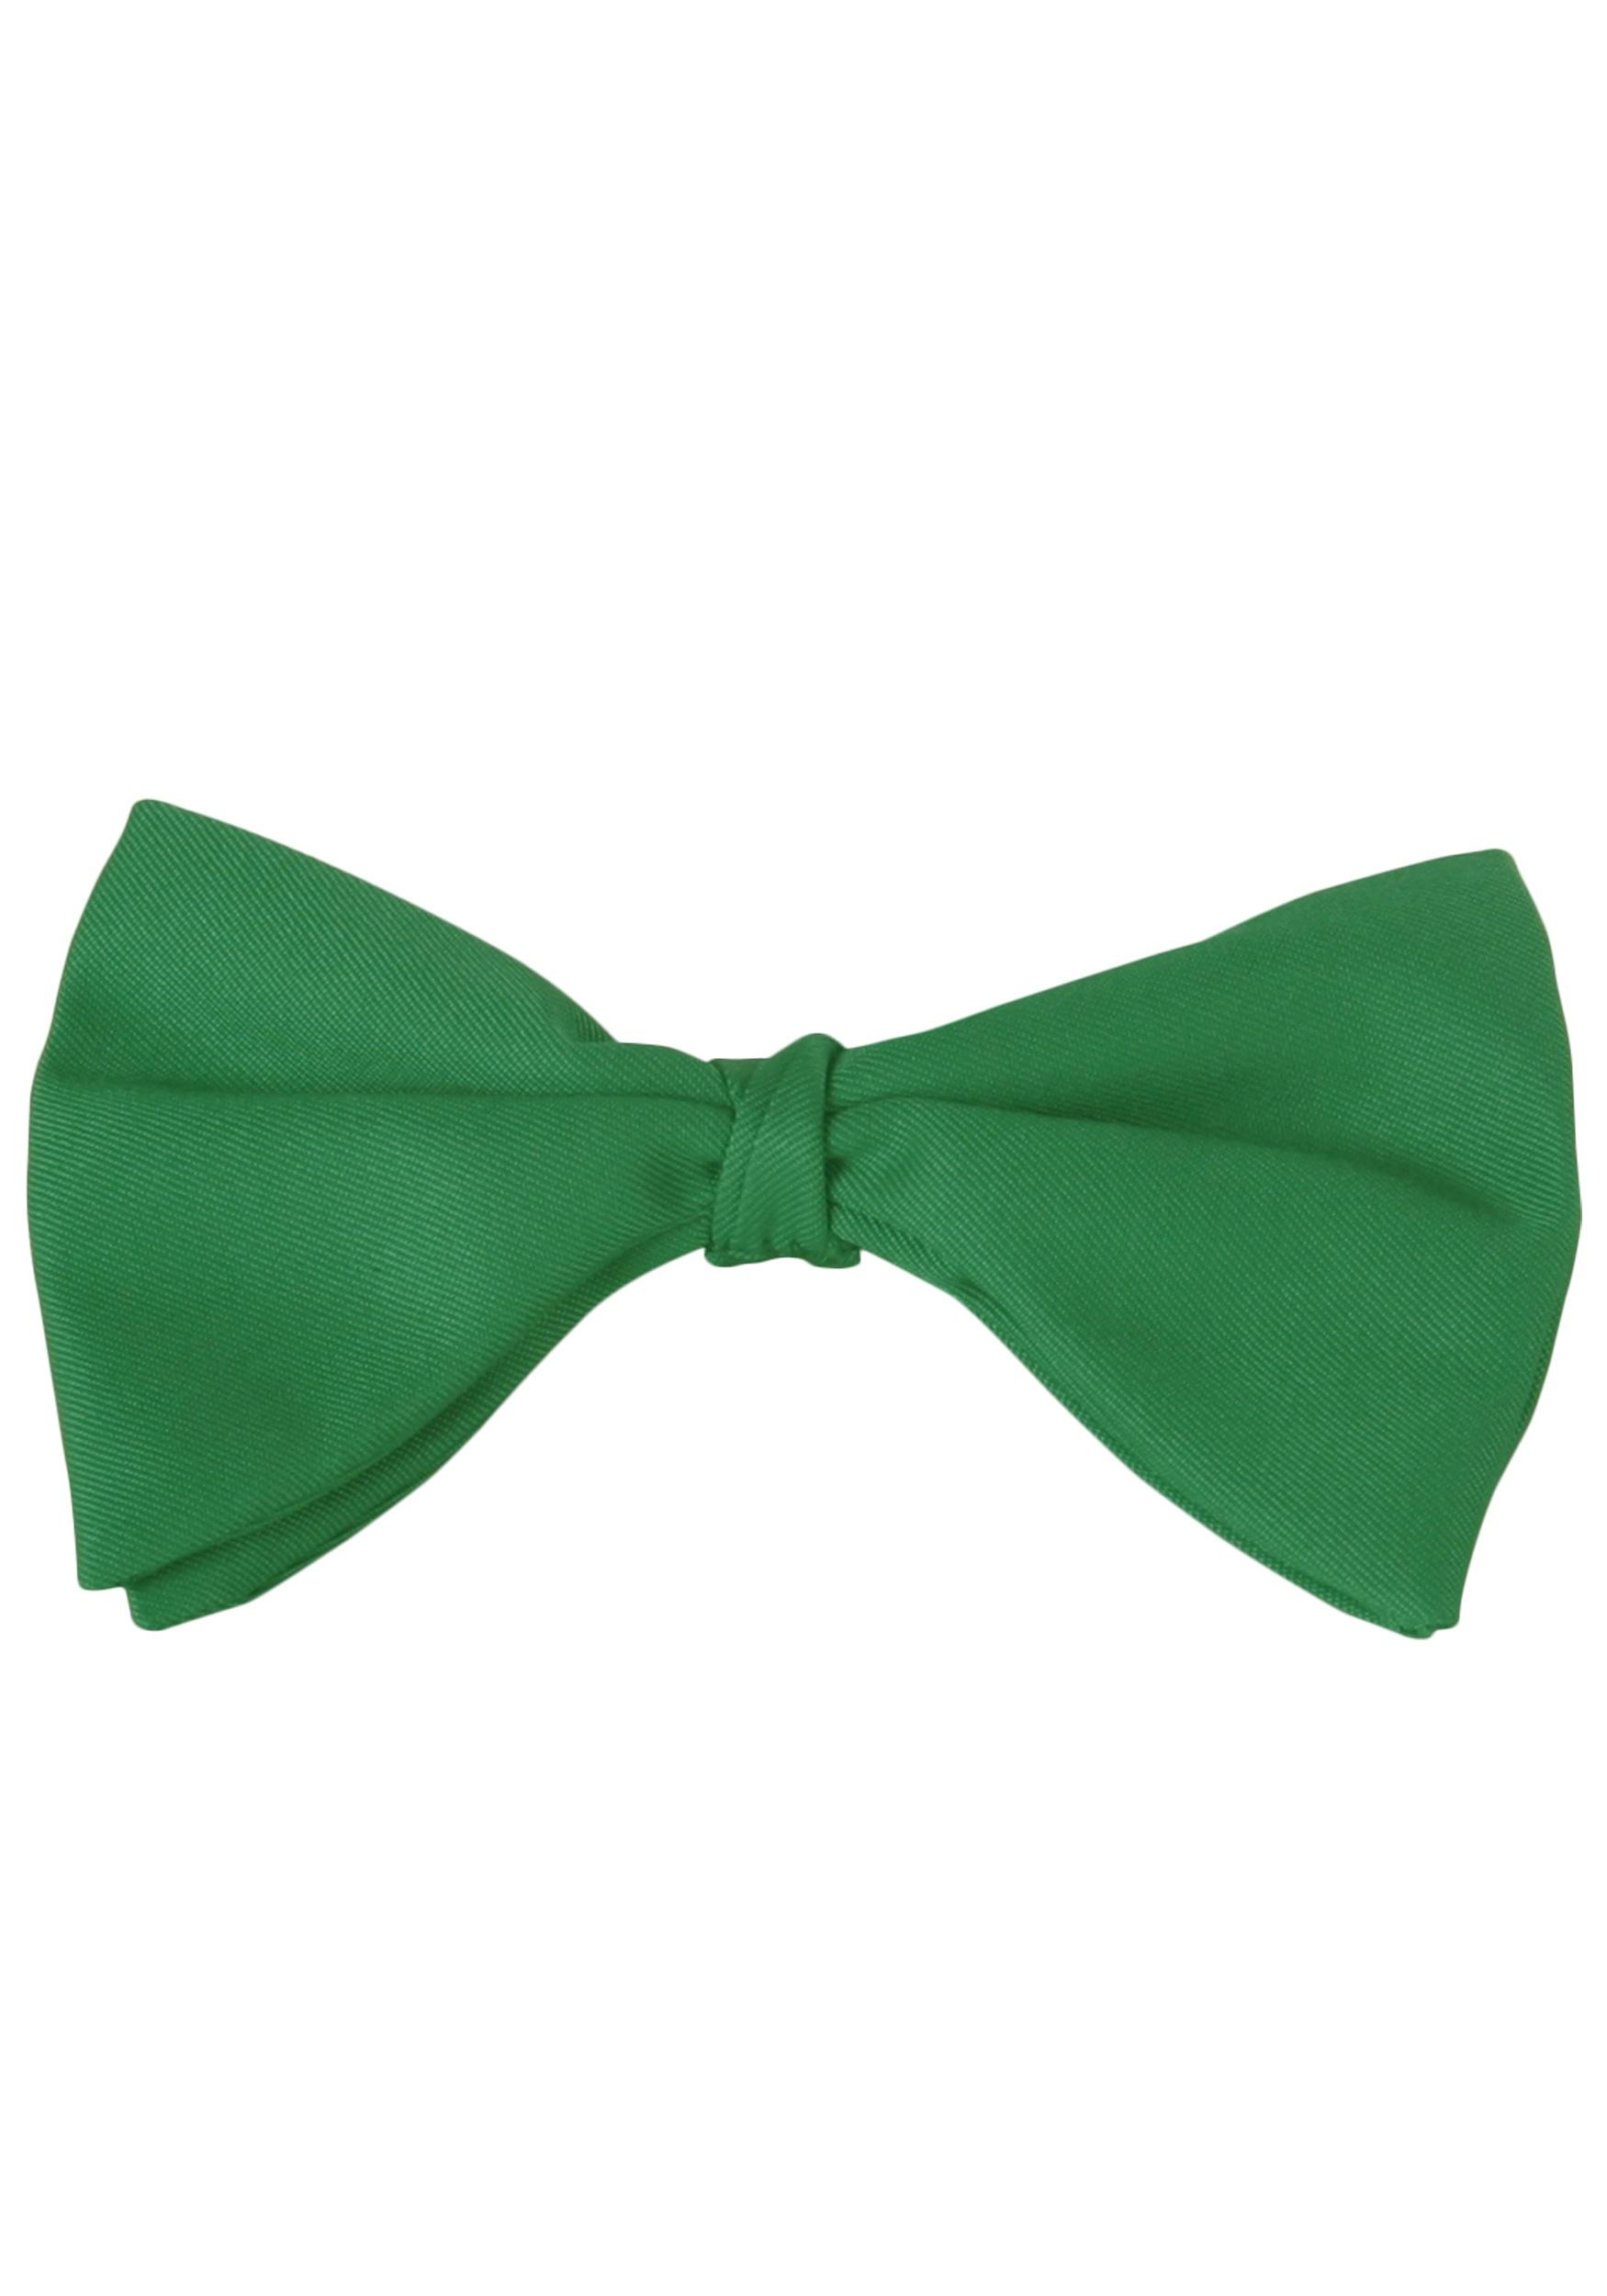 Bowtie clipart tuxedo. Green bow tie